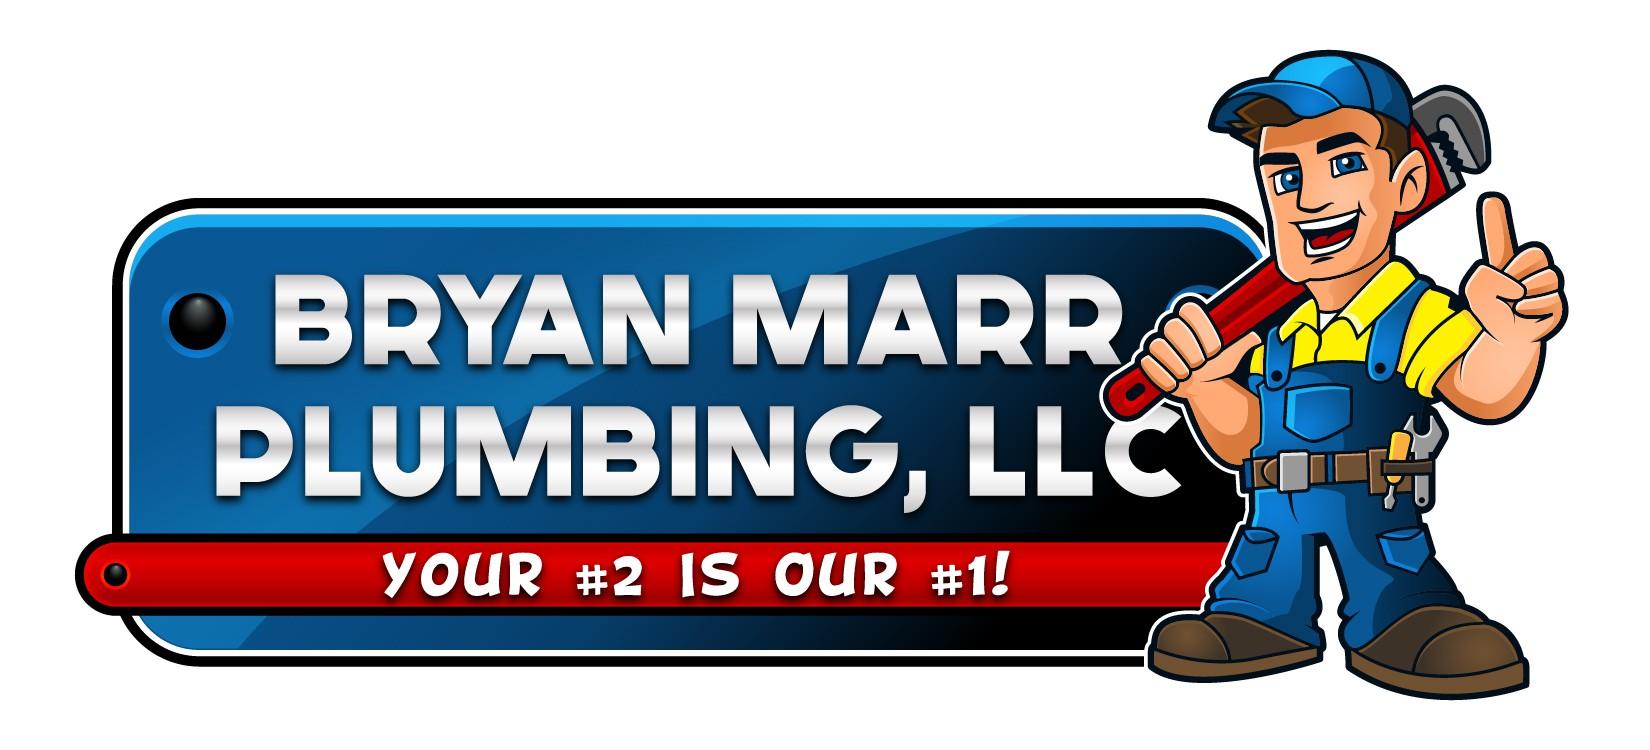 Help Bryan Marr Plumbing modernize their current logo